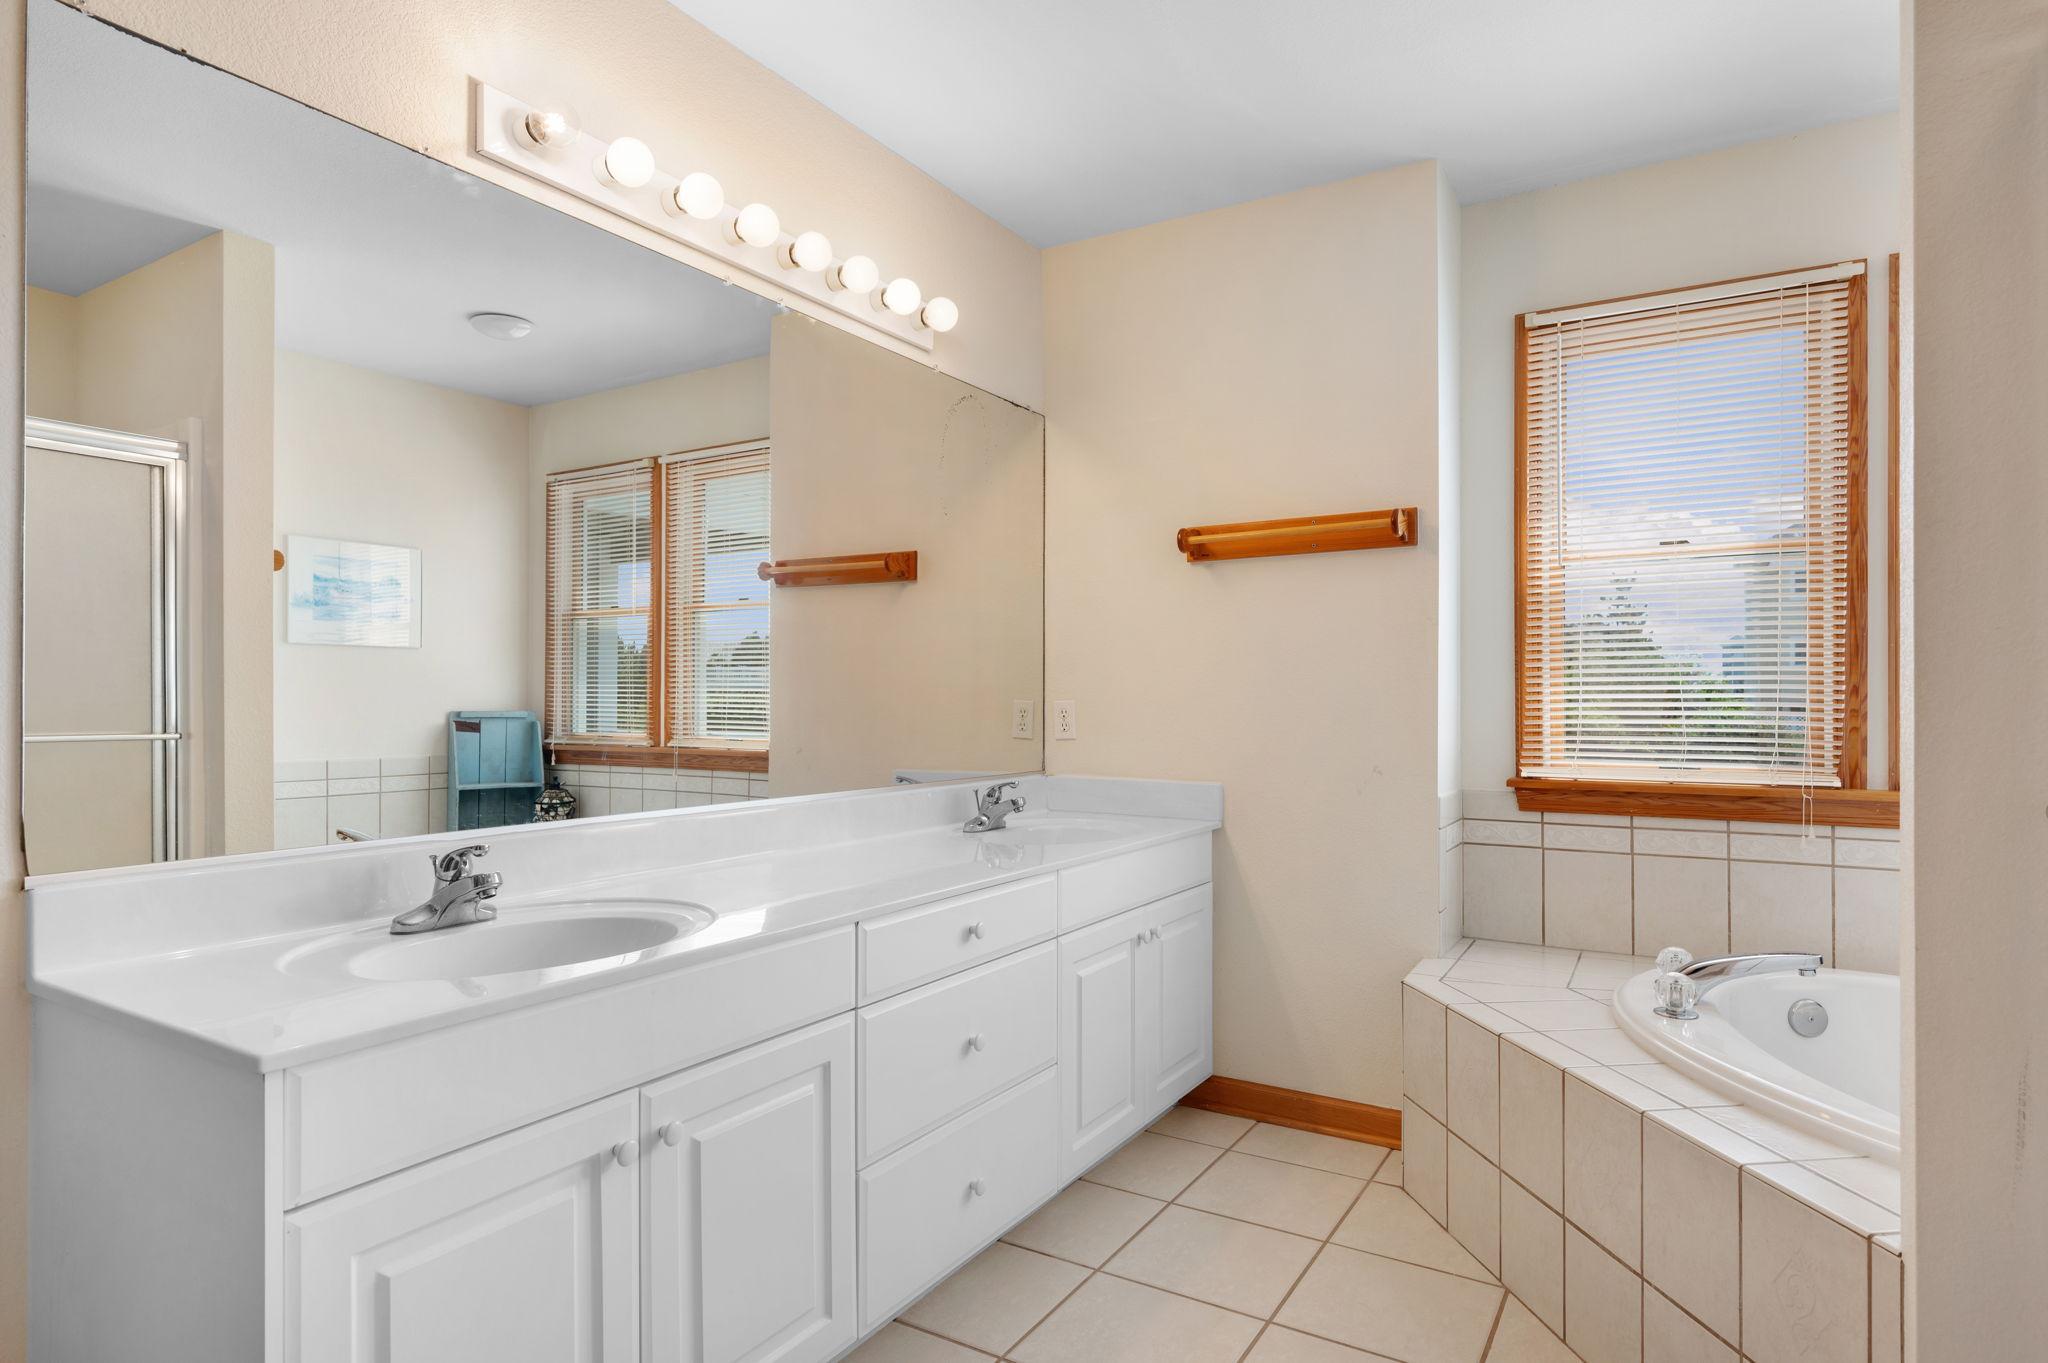 795 Mercury Road   Mid Level Bedroom 3 - Private Bath